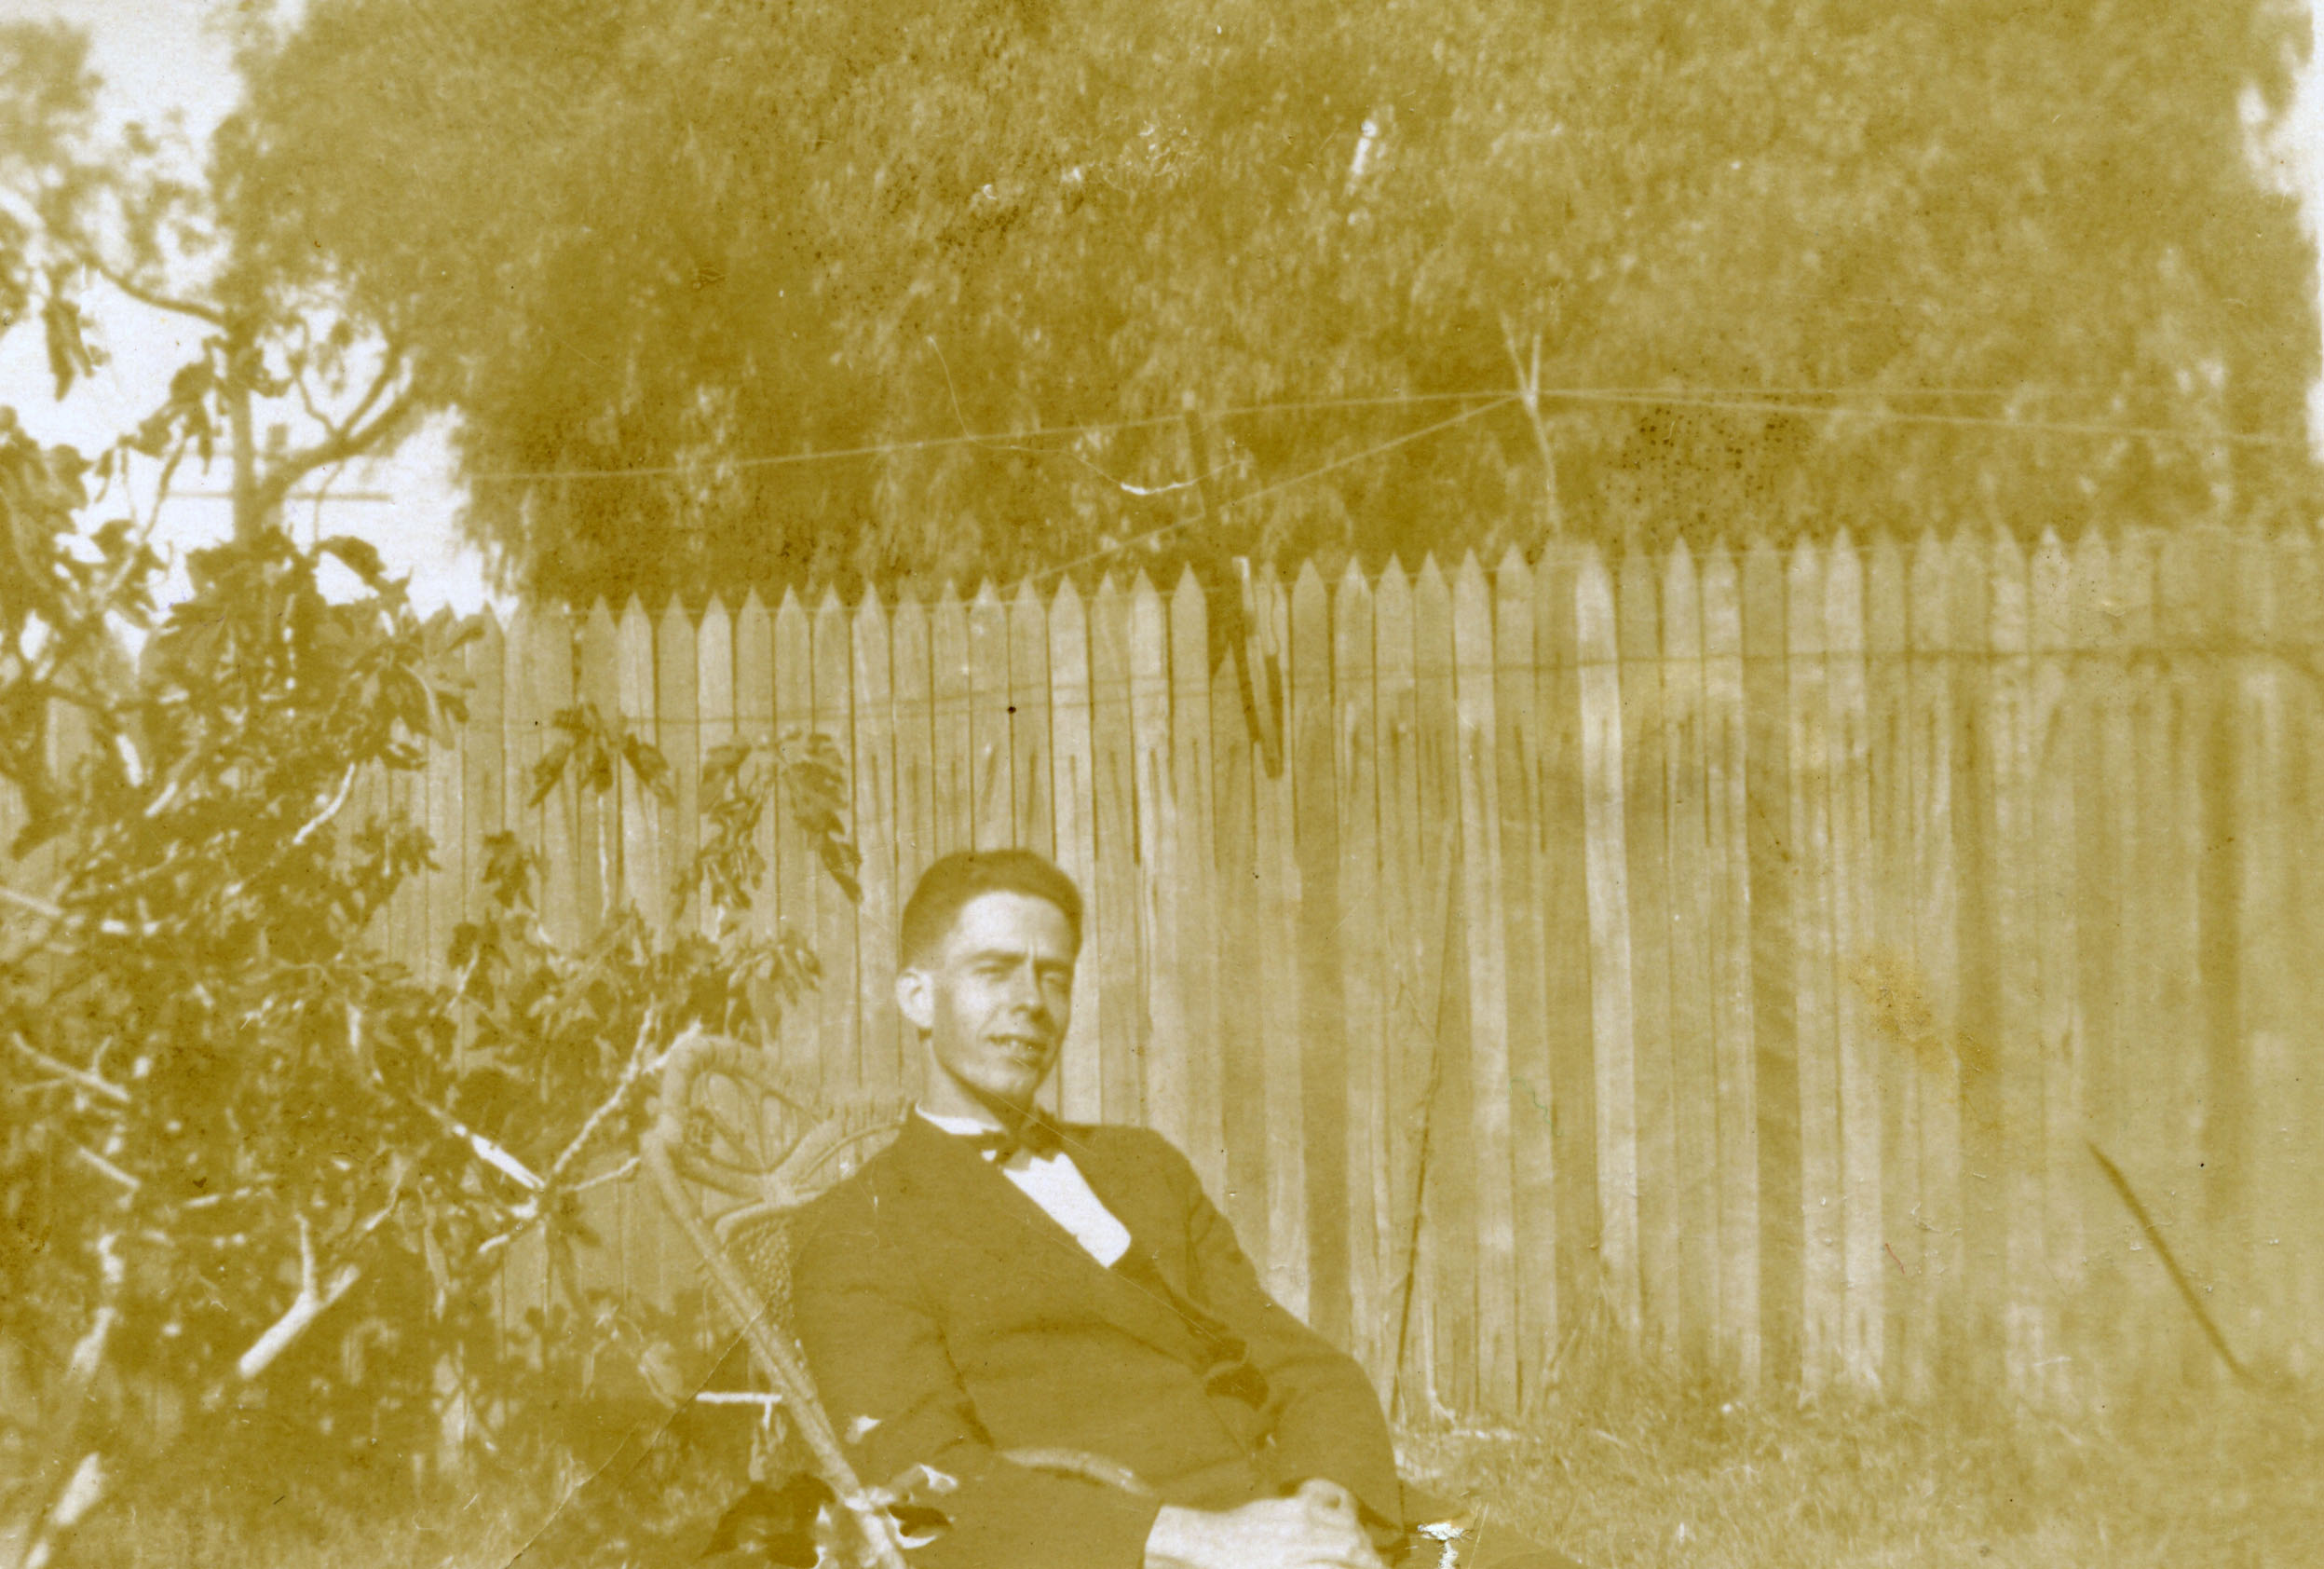 103. William Slyth, Highgate 1926